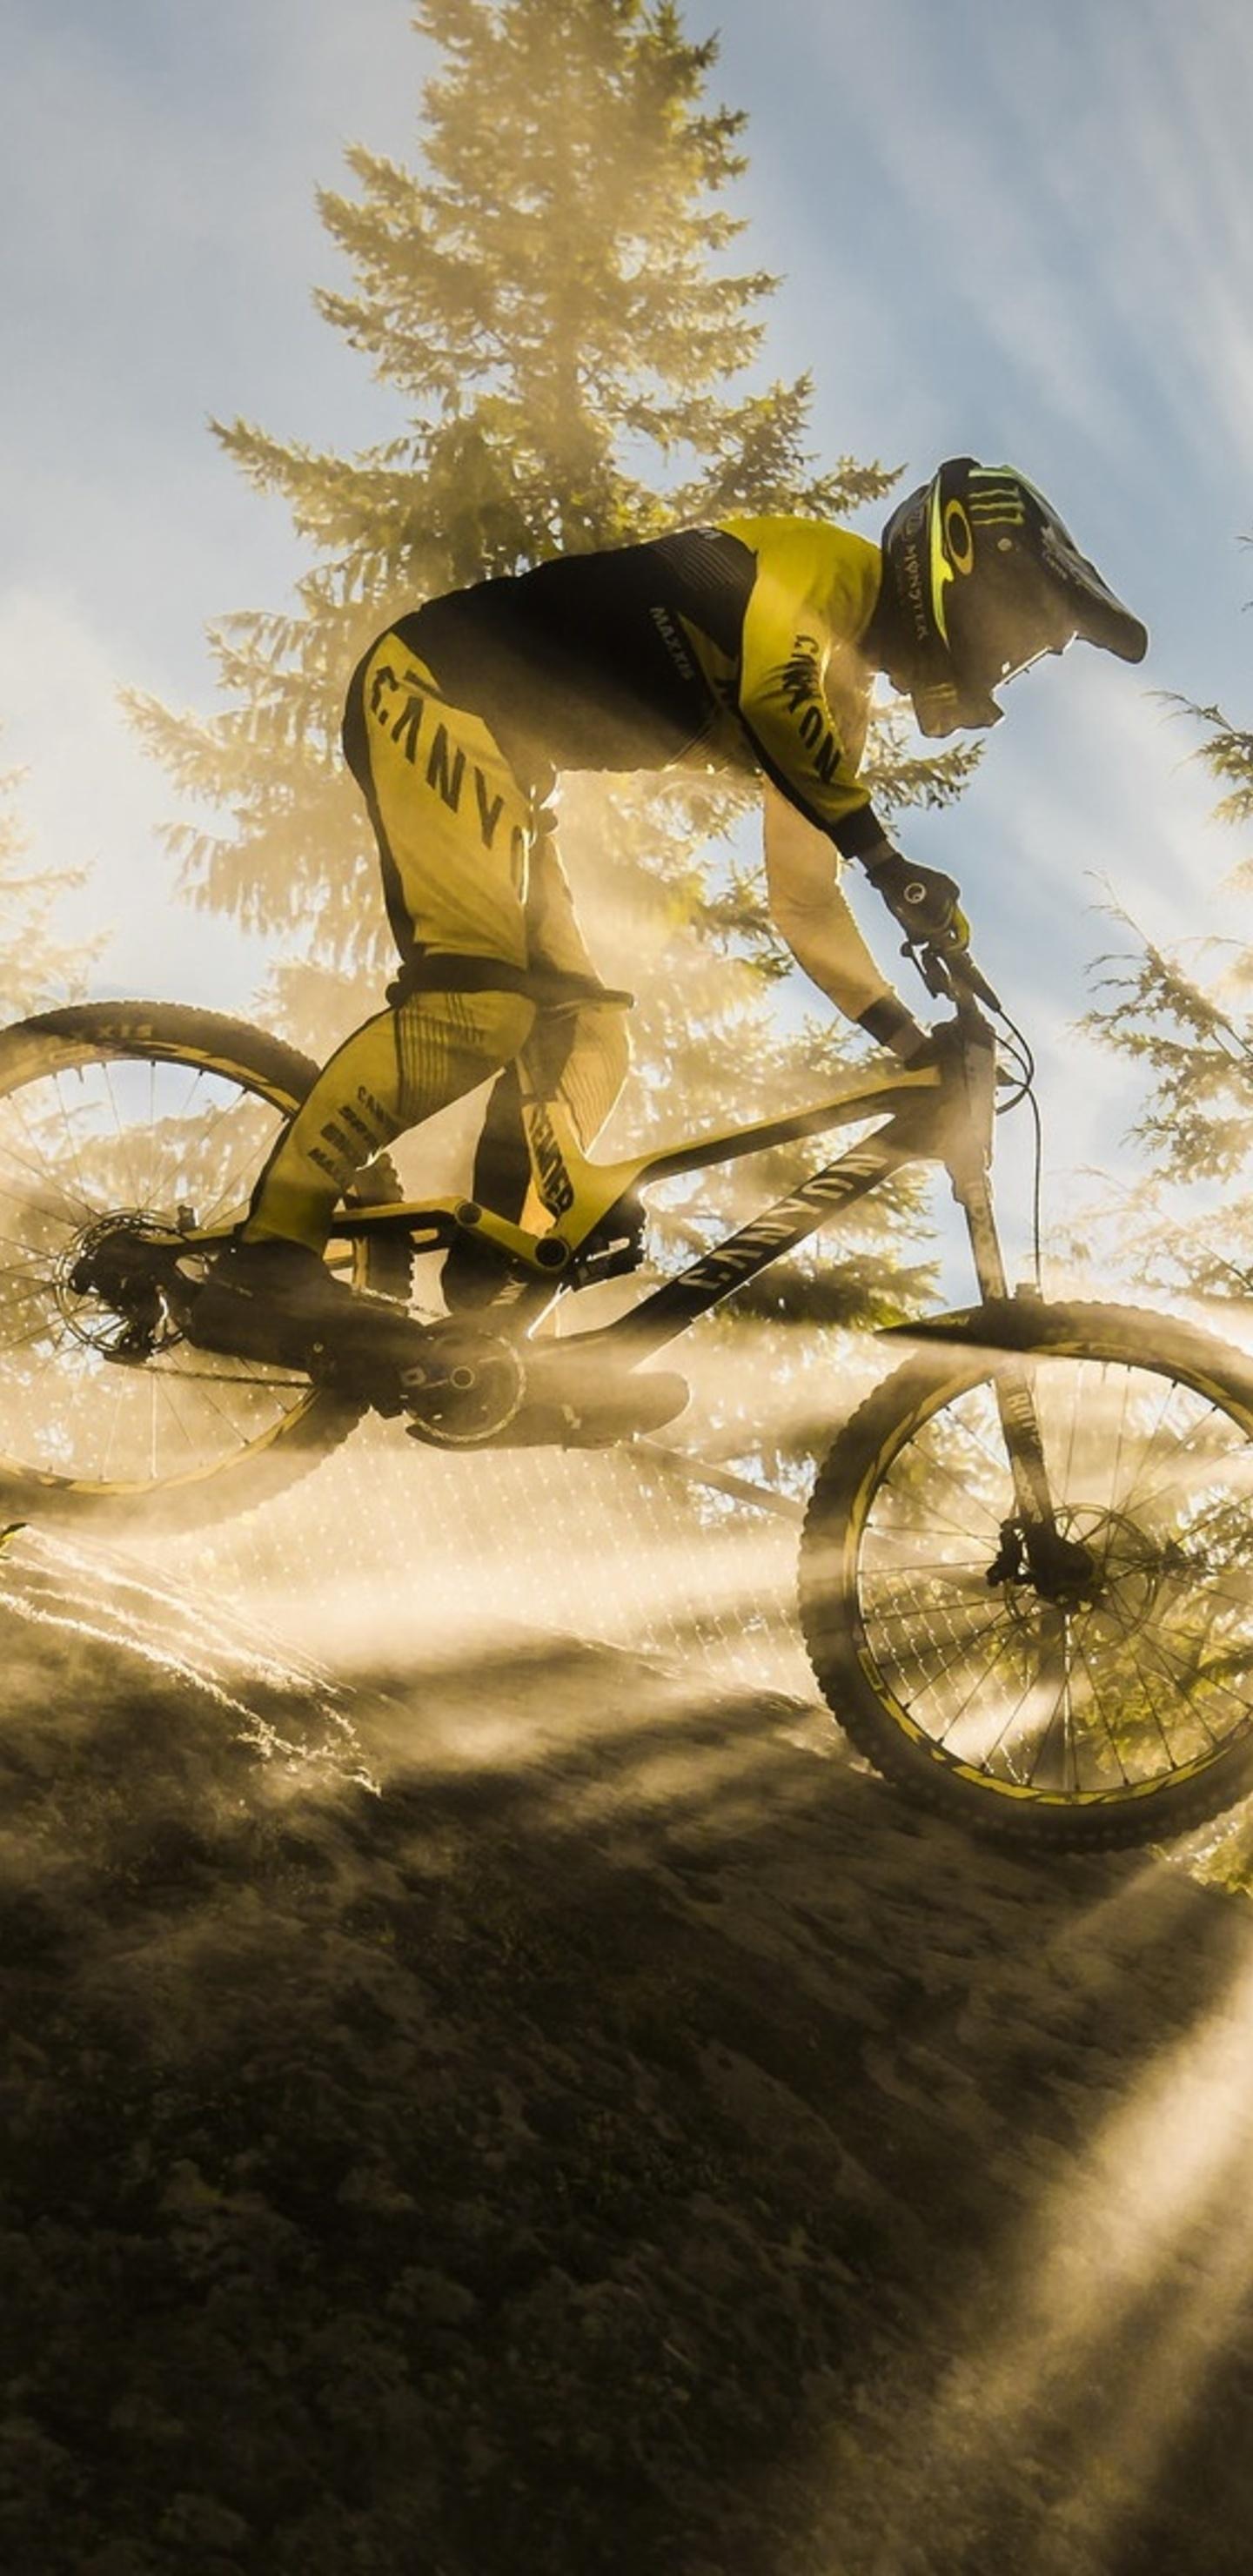 1440x2960 Mountain Bike Sunbeam Samsung Galaxy Note 9 8 S9 S8 S8